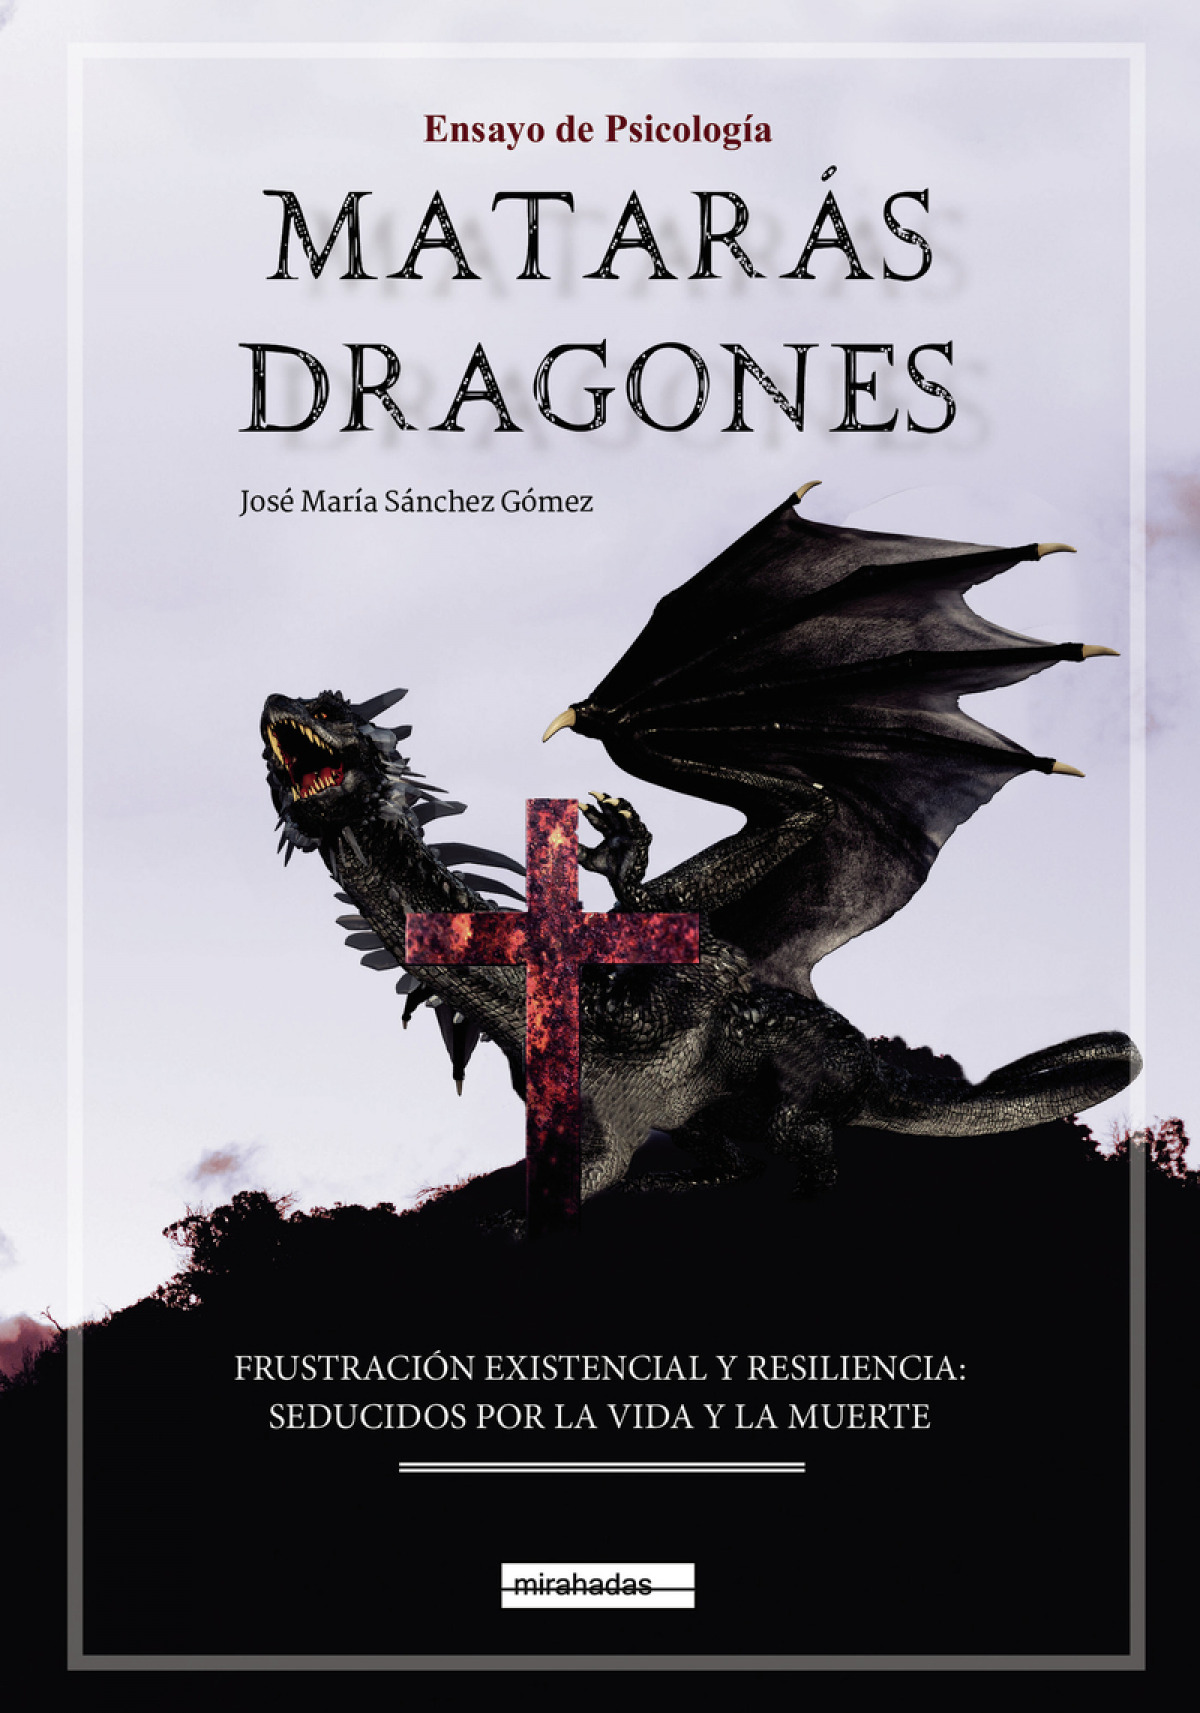 MATARÁS DRAGONES